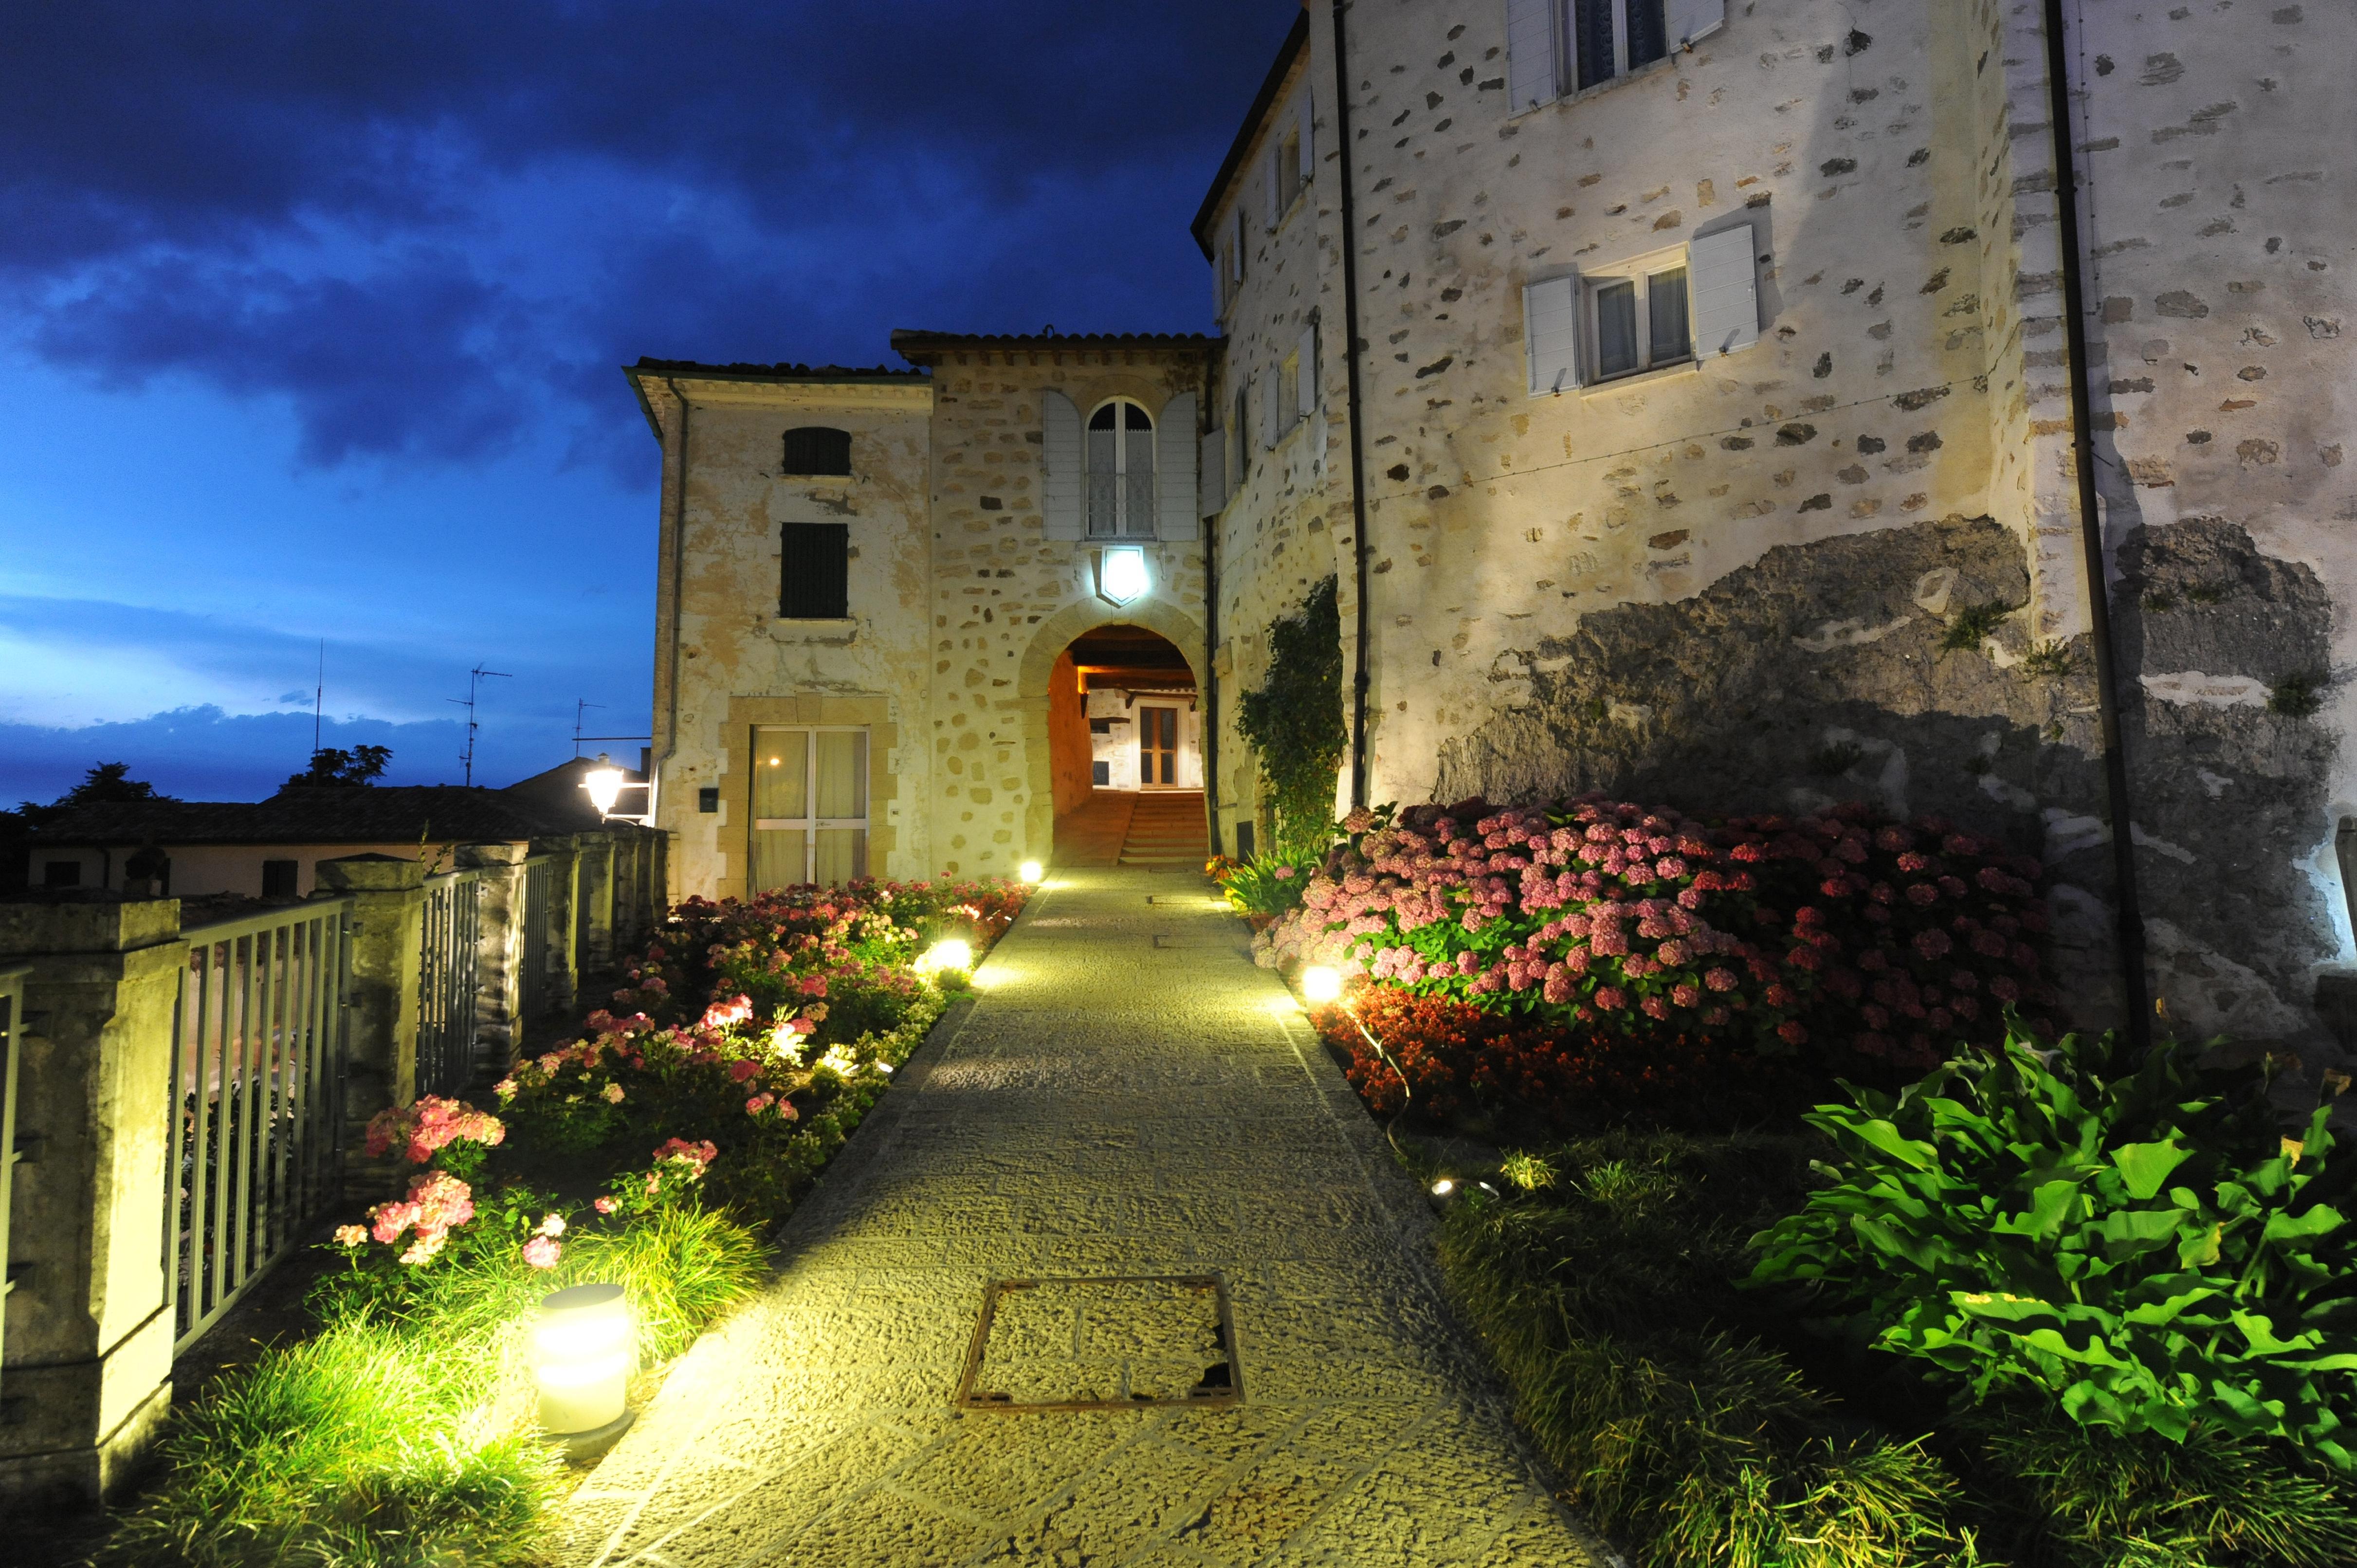 Lighting design e risparmio energetico per un borgo medievale